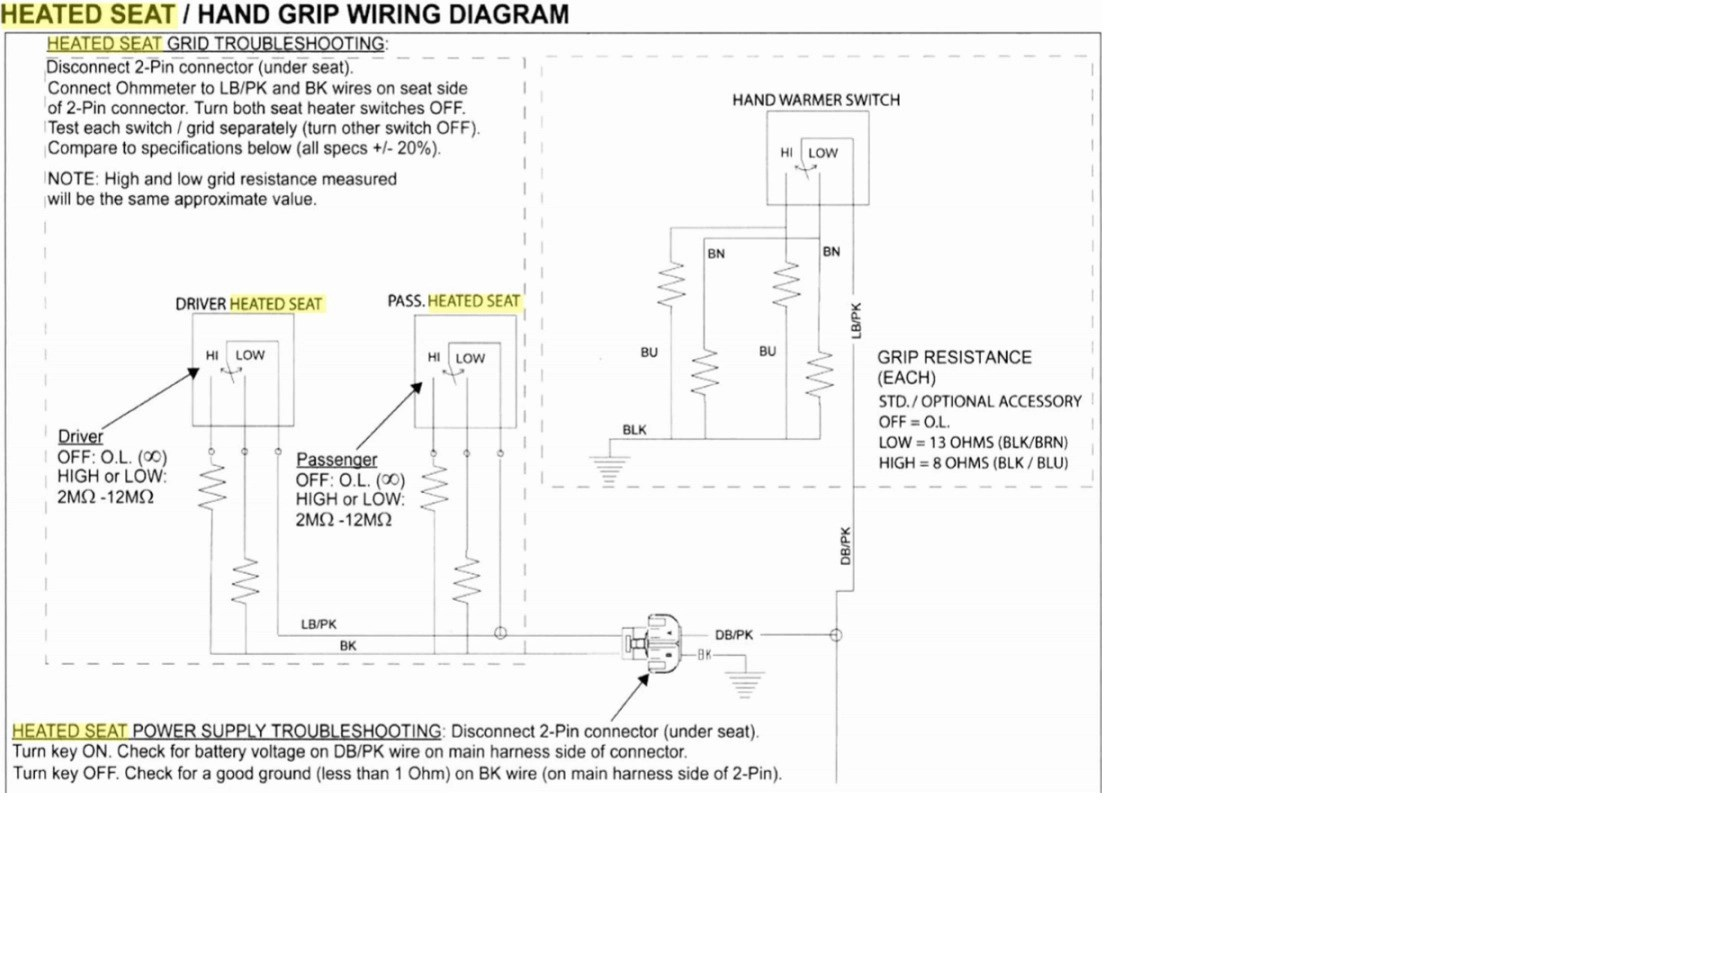 2014 Ski Doo Headlight Wiring Diagram Power For Oem Heated Grips Victory Motorcycles